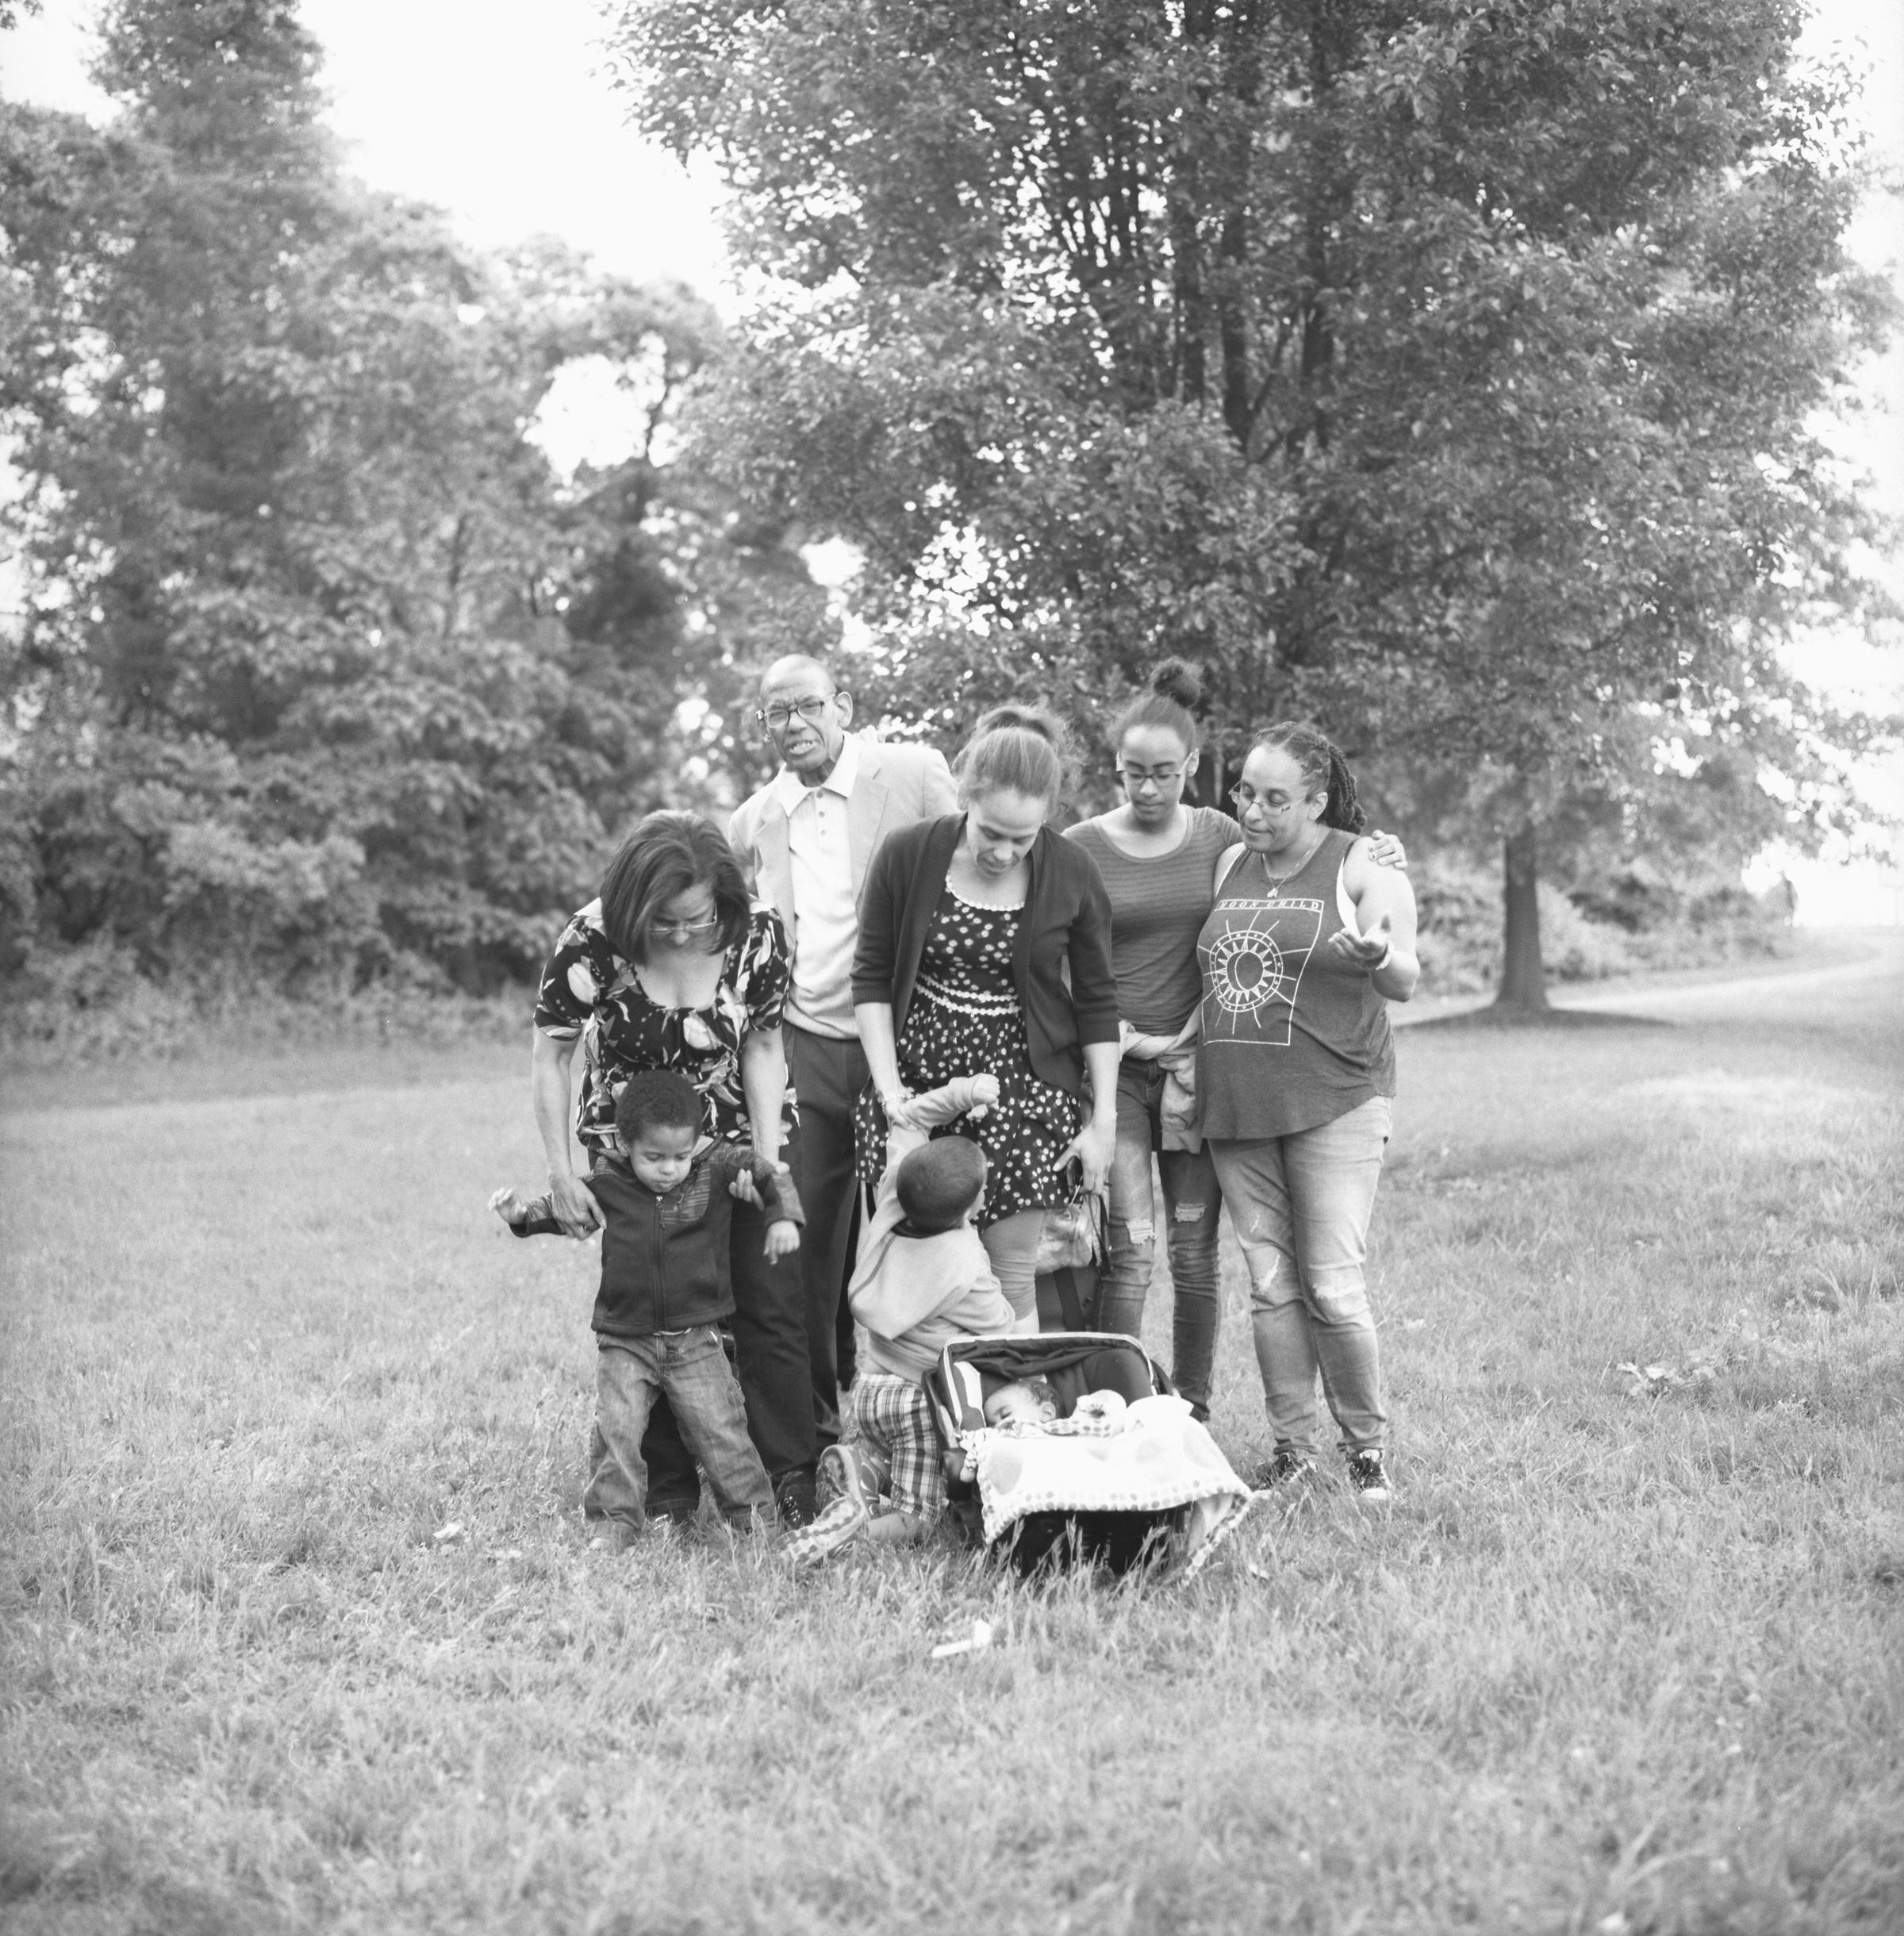 Laura & her family